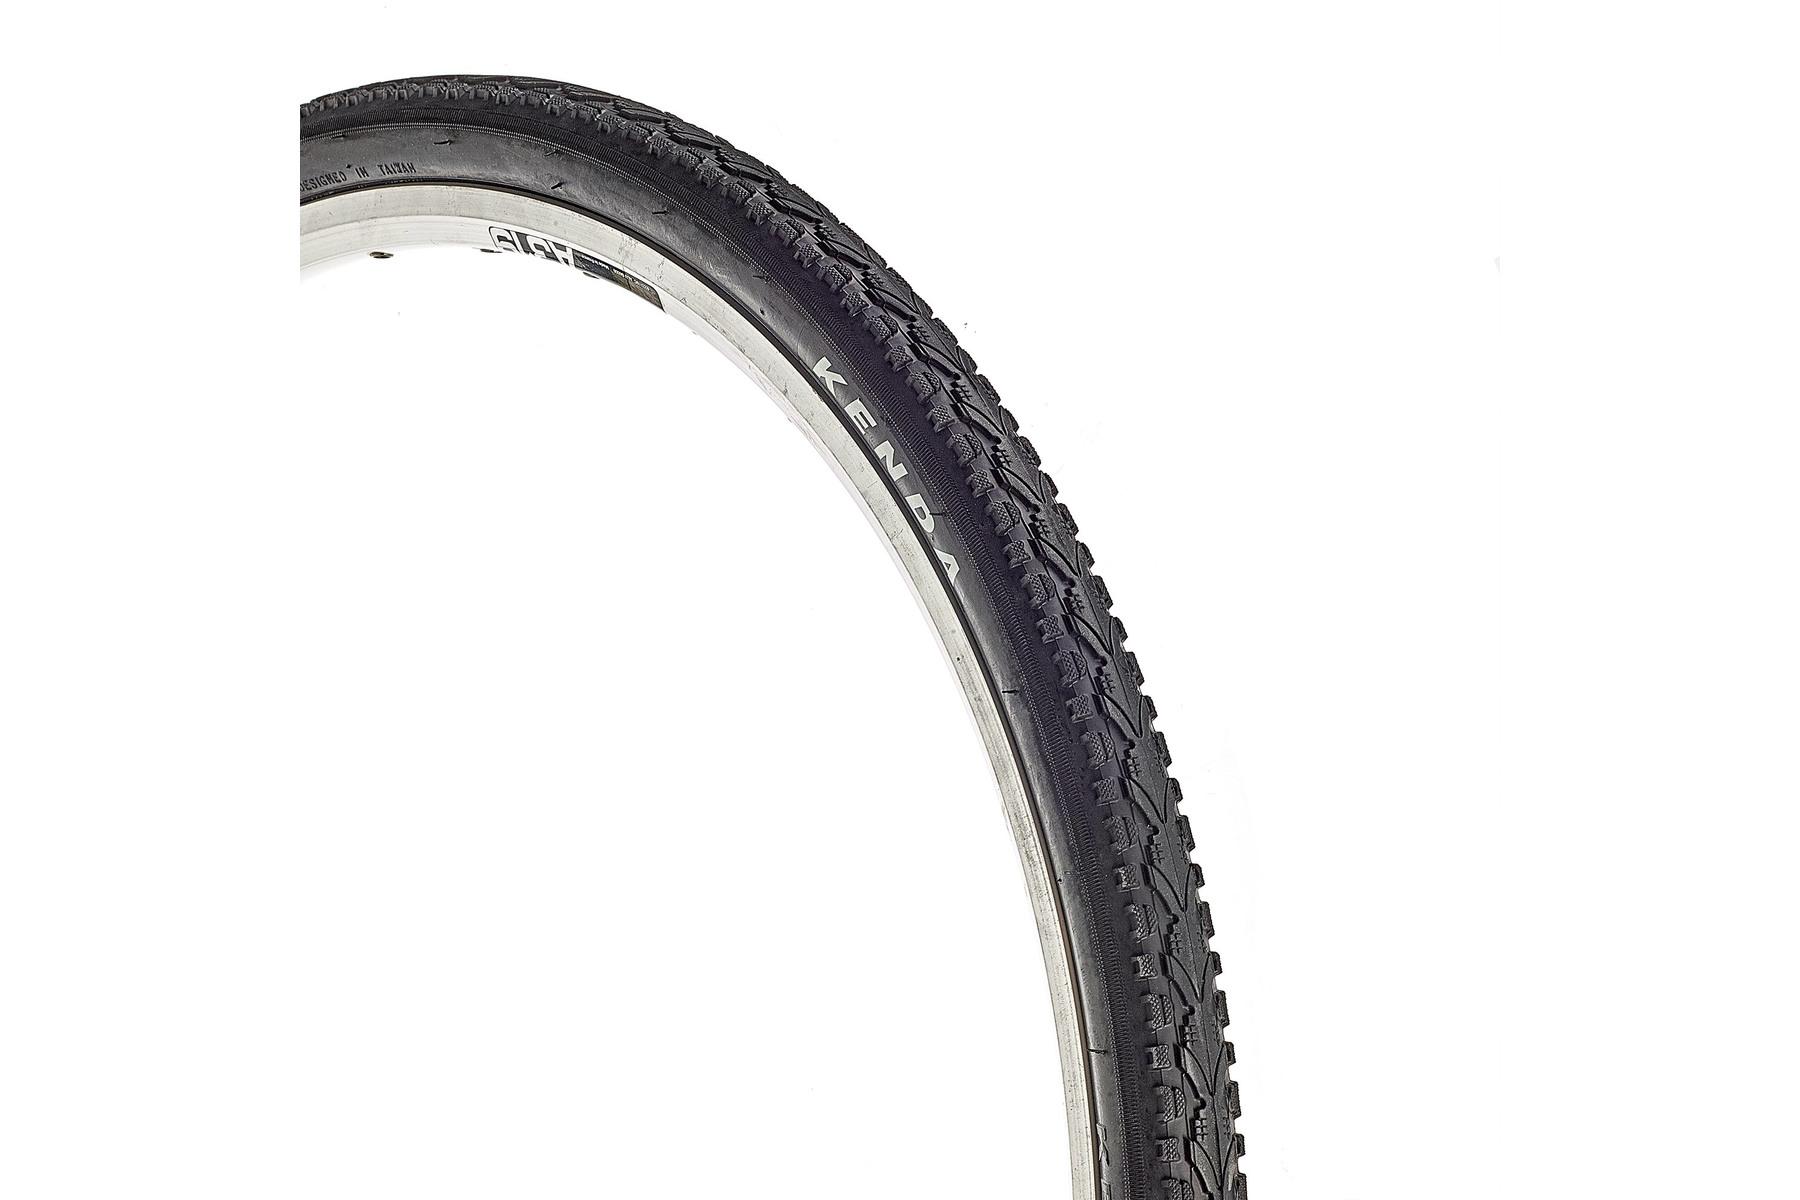 achetez kenda khan k 935 pneu tous chemins rose bikes. Black Bedroom Furniture Sets. Home Design Ideas